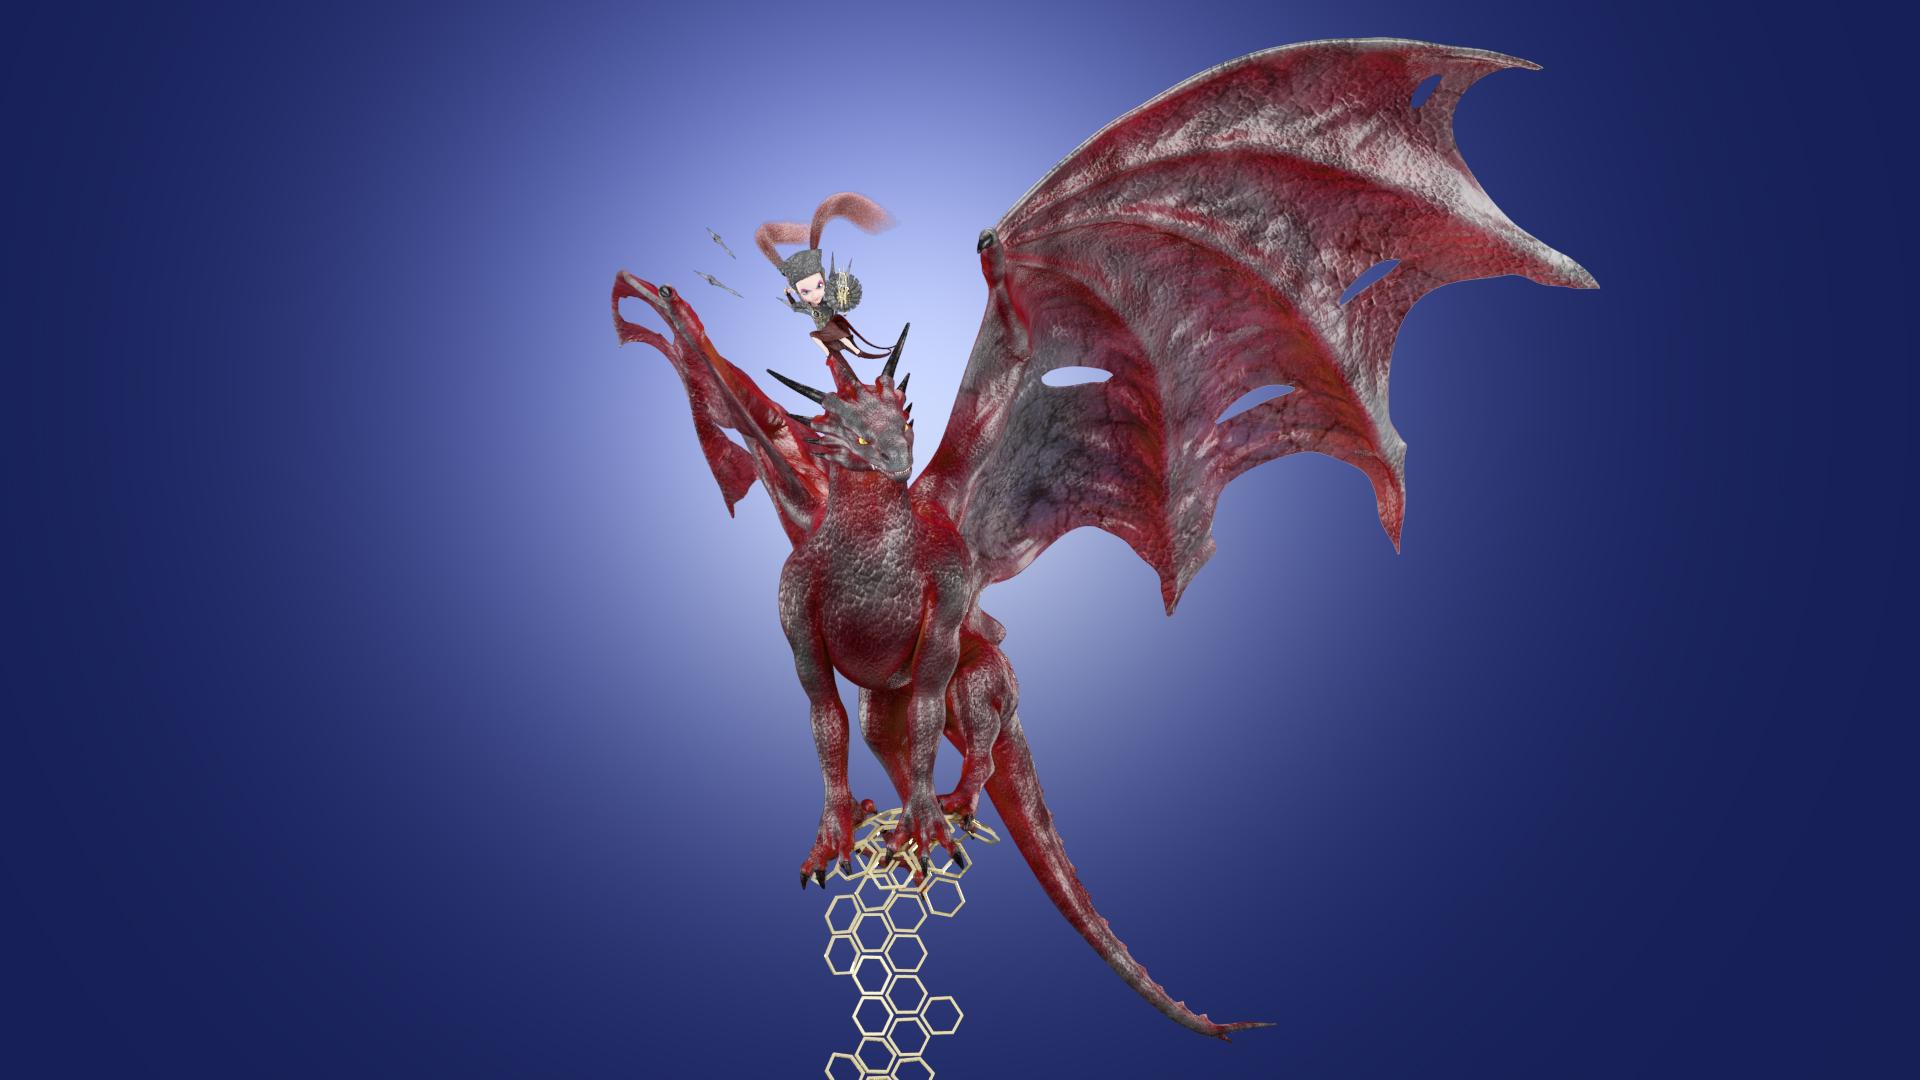 The Girl riding Dragon view 1